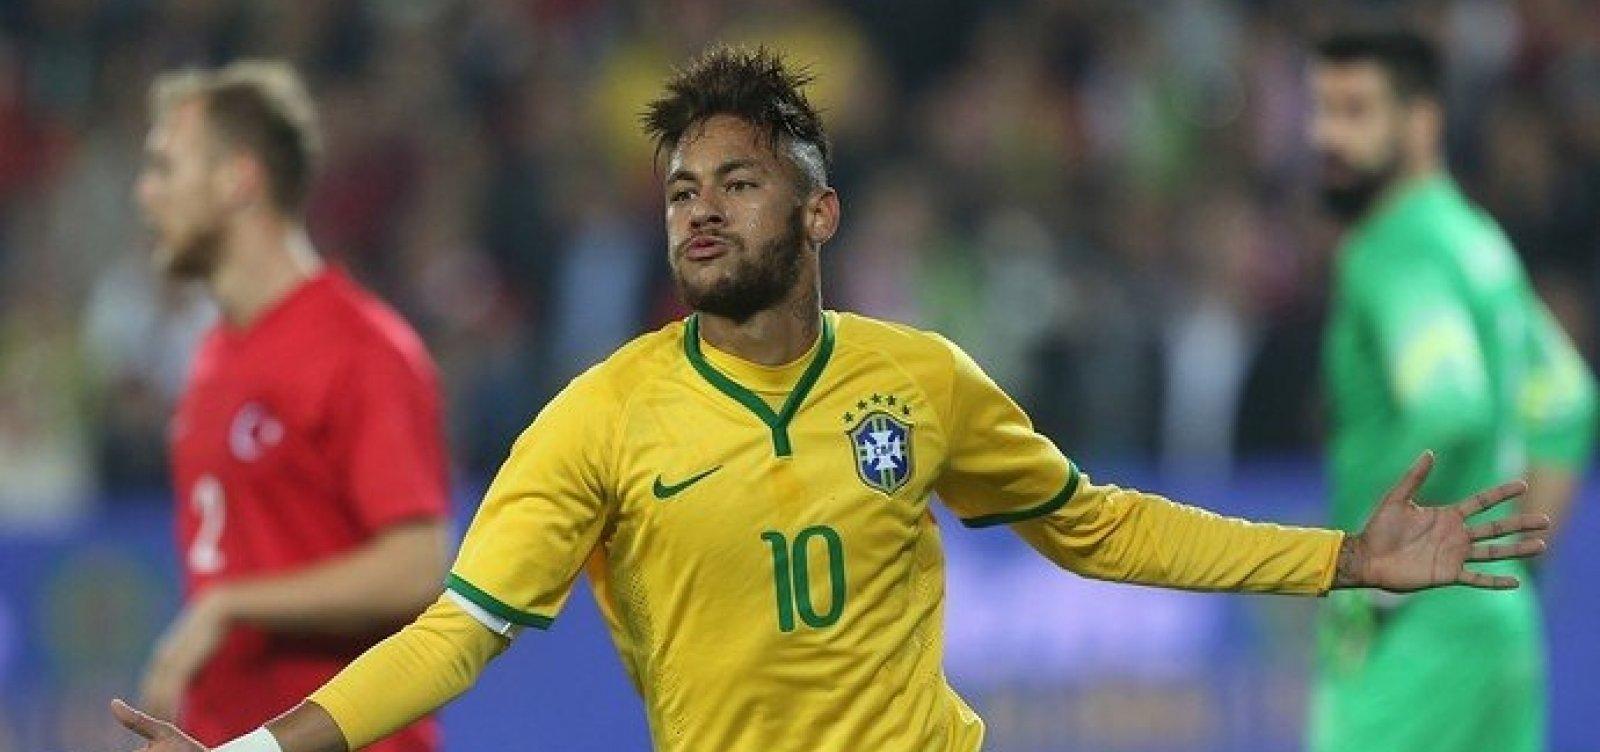 'Ninguém tem sangue de barata', diz Neymar após soco em torcedor